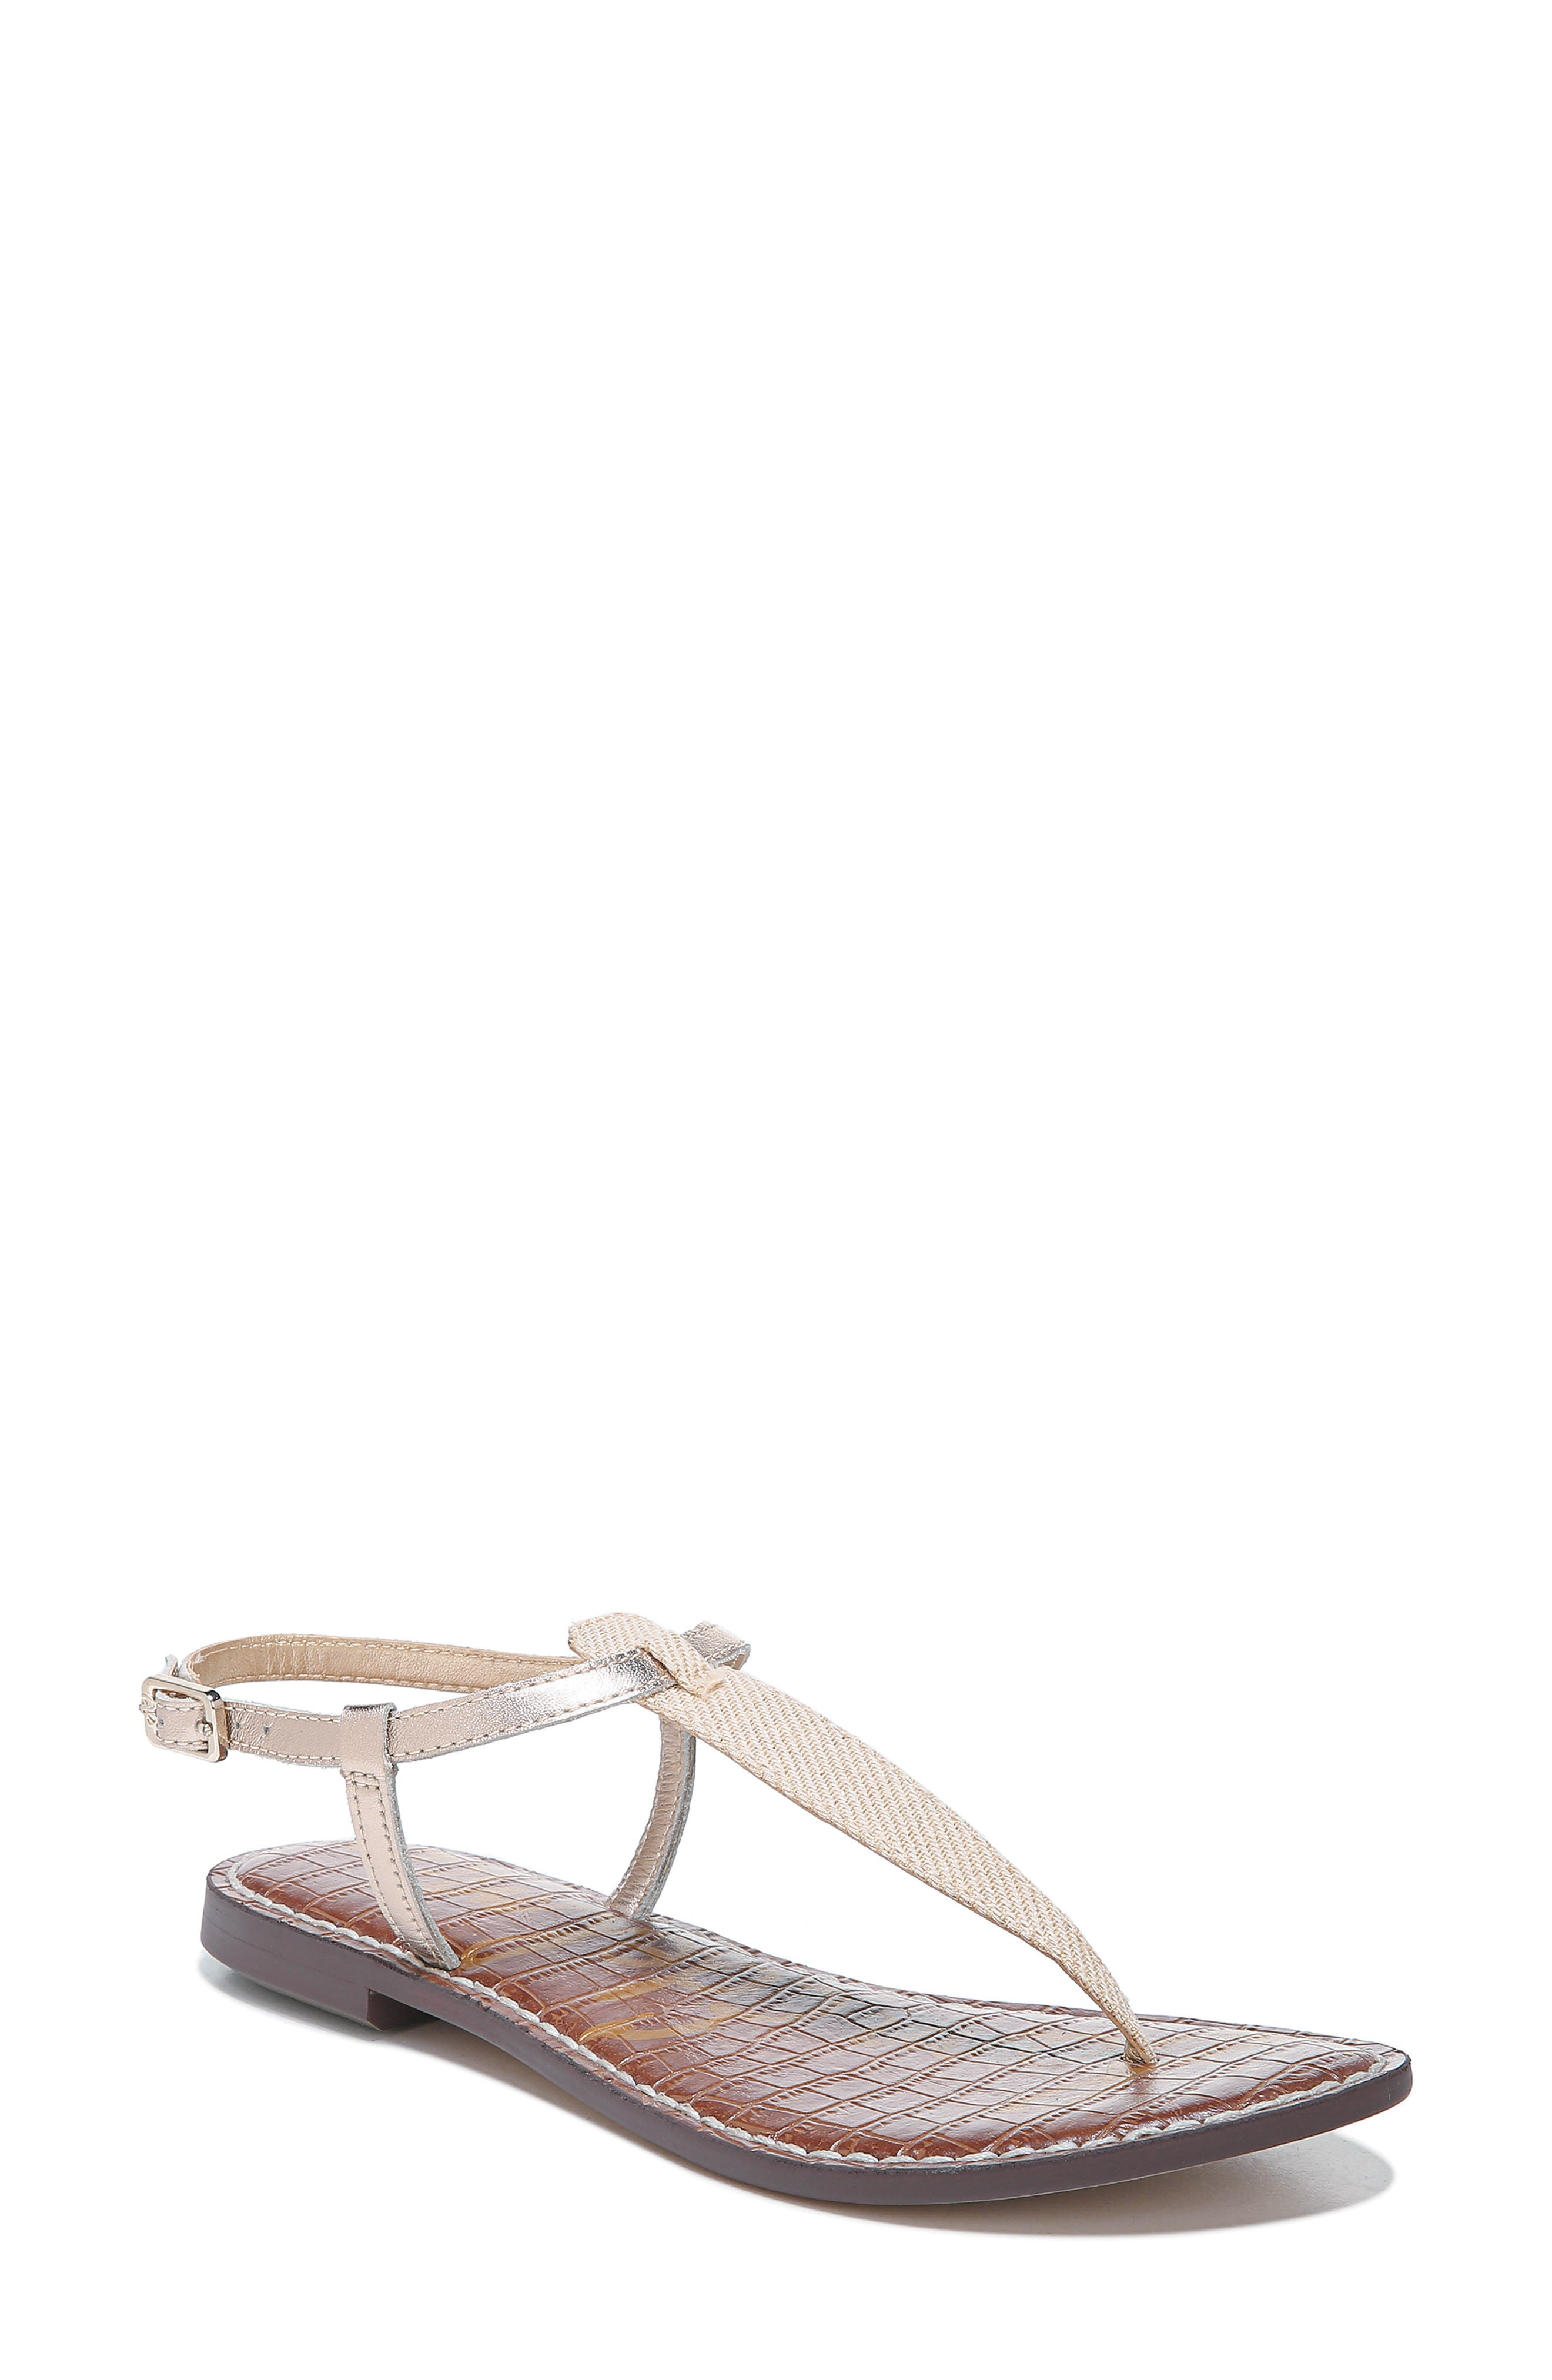 dac5a67041c Sam Edelman Ankle Strap Sandals for Women